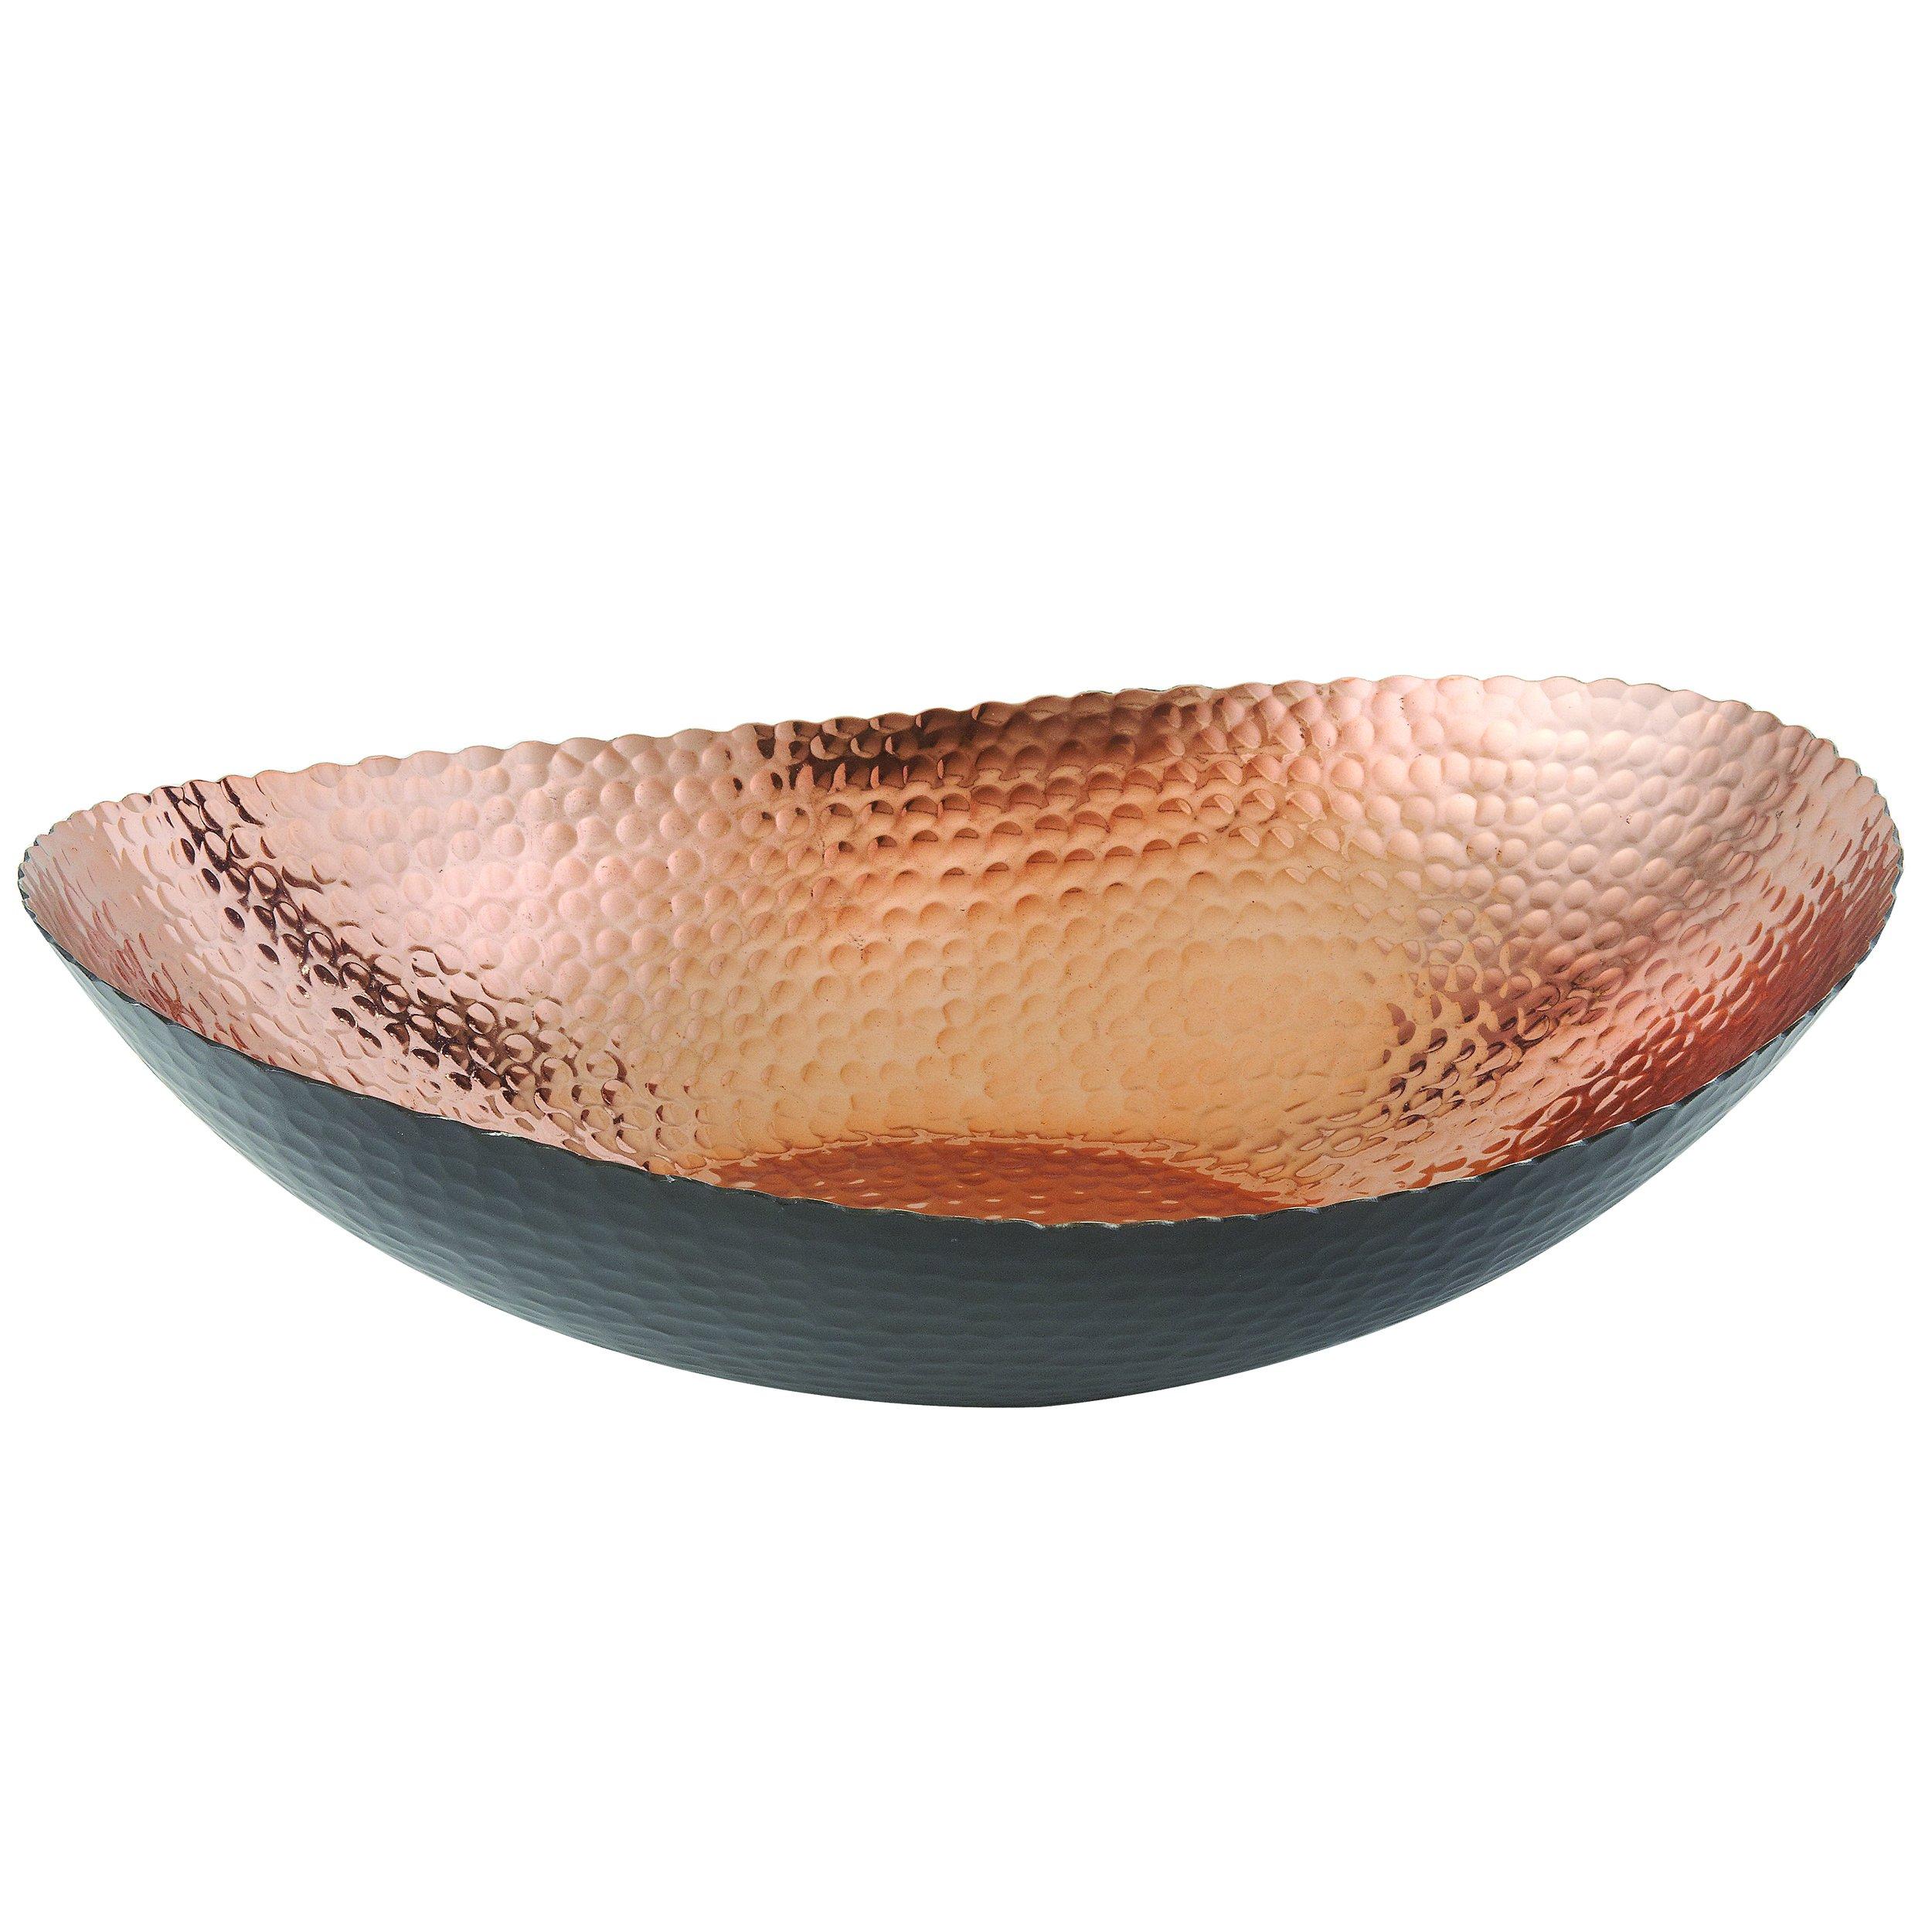 Elegance 72091 Oval Bowl, 14.75'' x 11'', Black/Copper